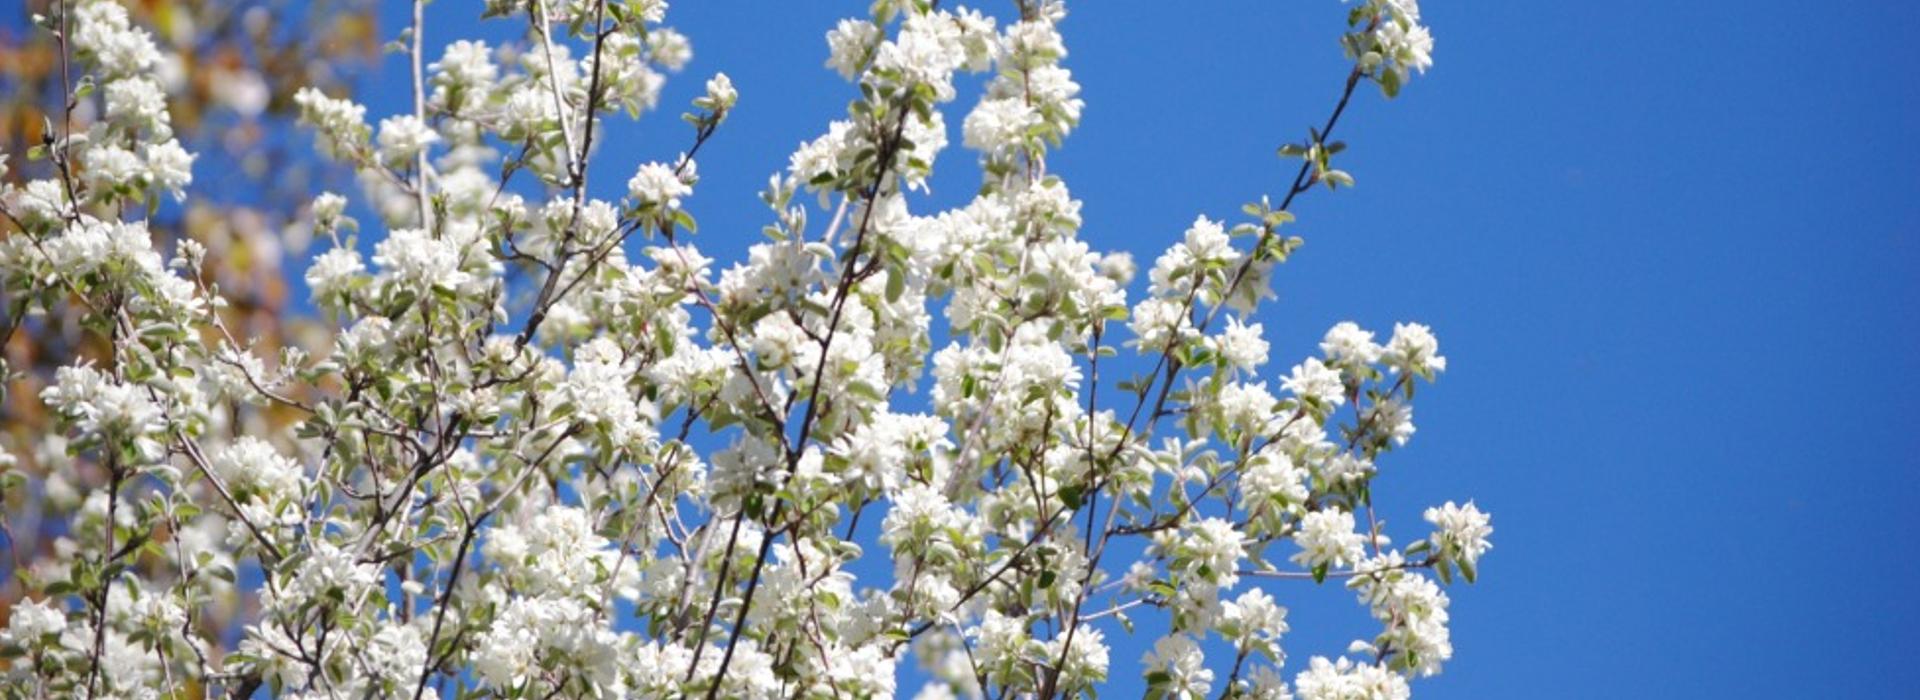 Guillomo (Amelanchier ovalis) en flor